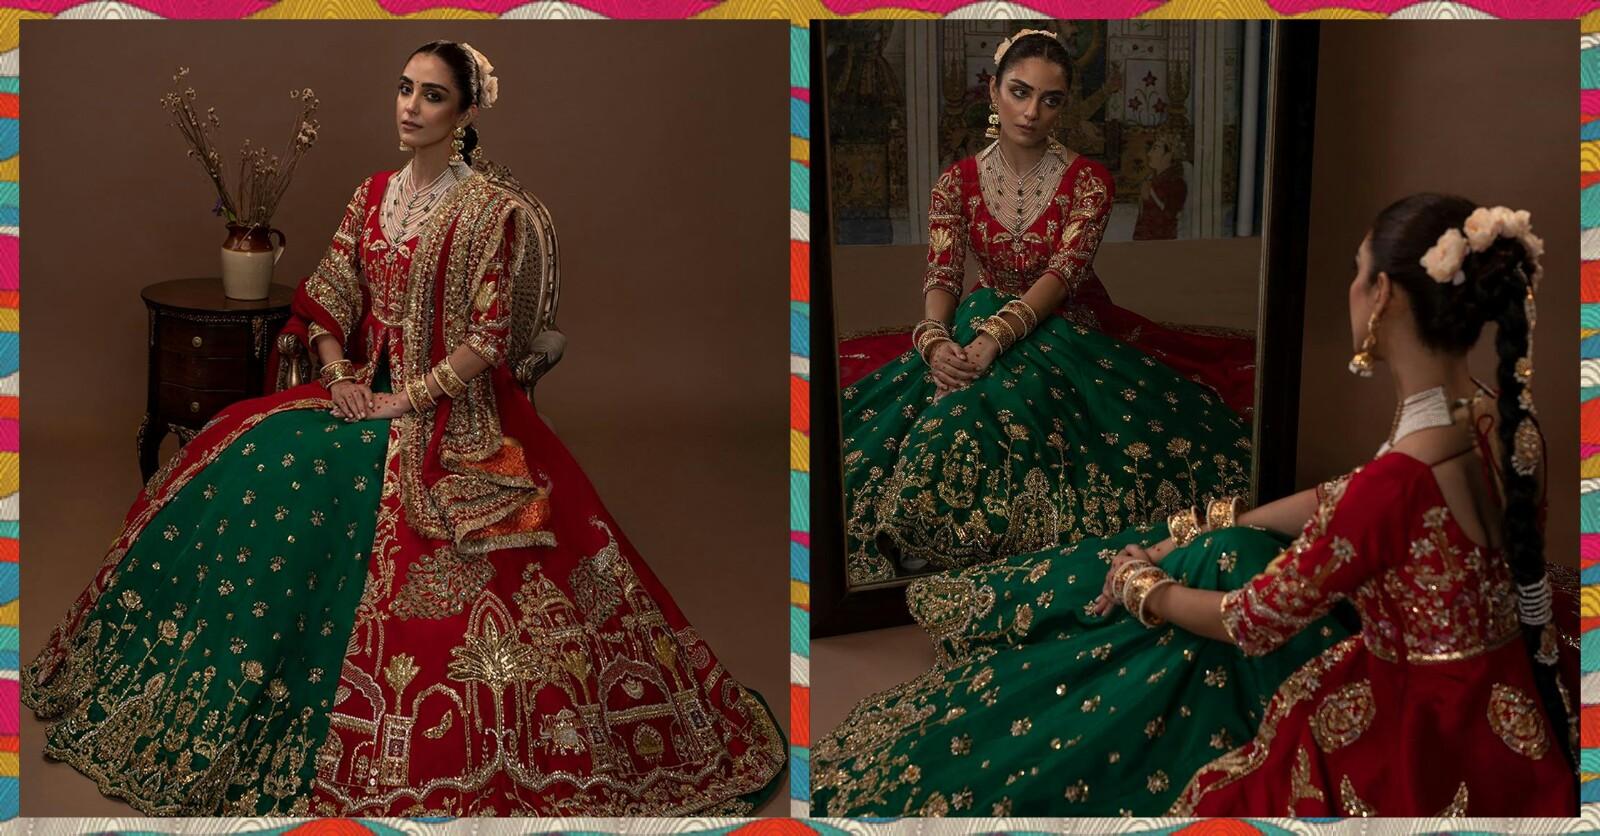 Maya Ali New Photohoot for Designer Ali Xeeshan